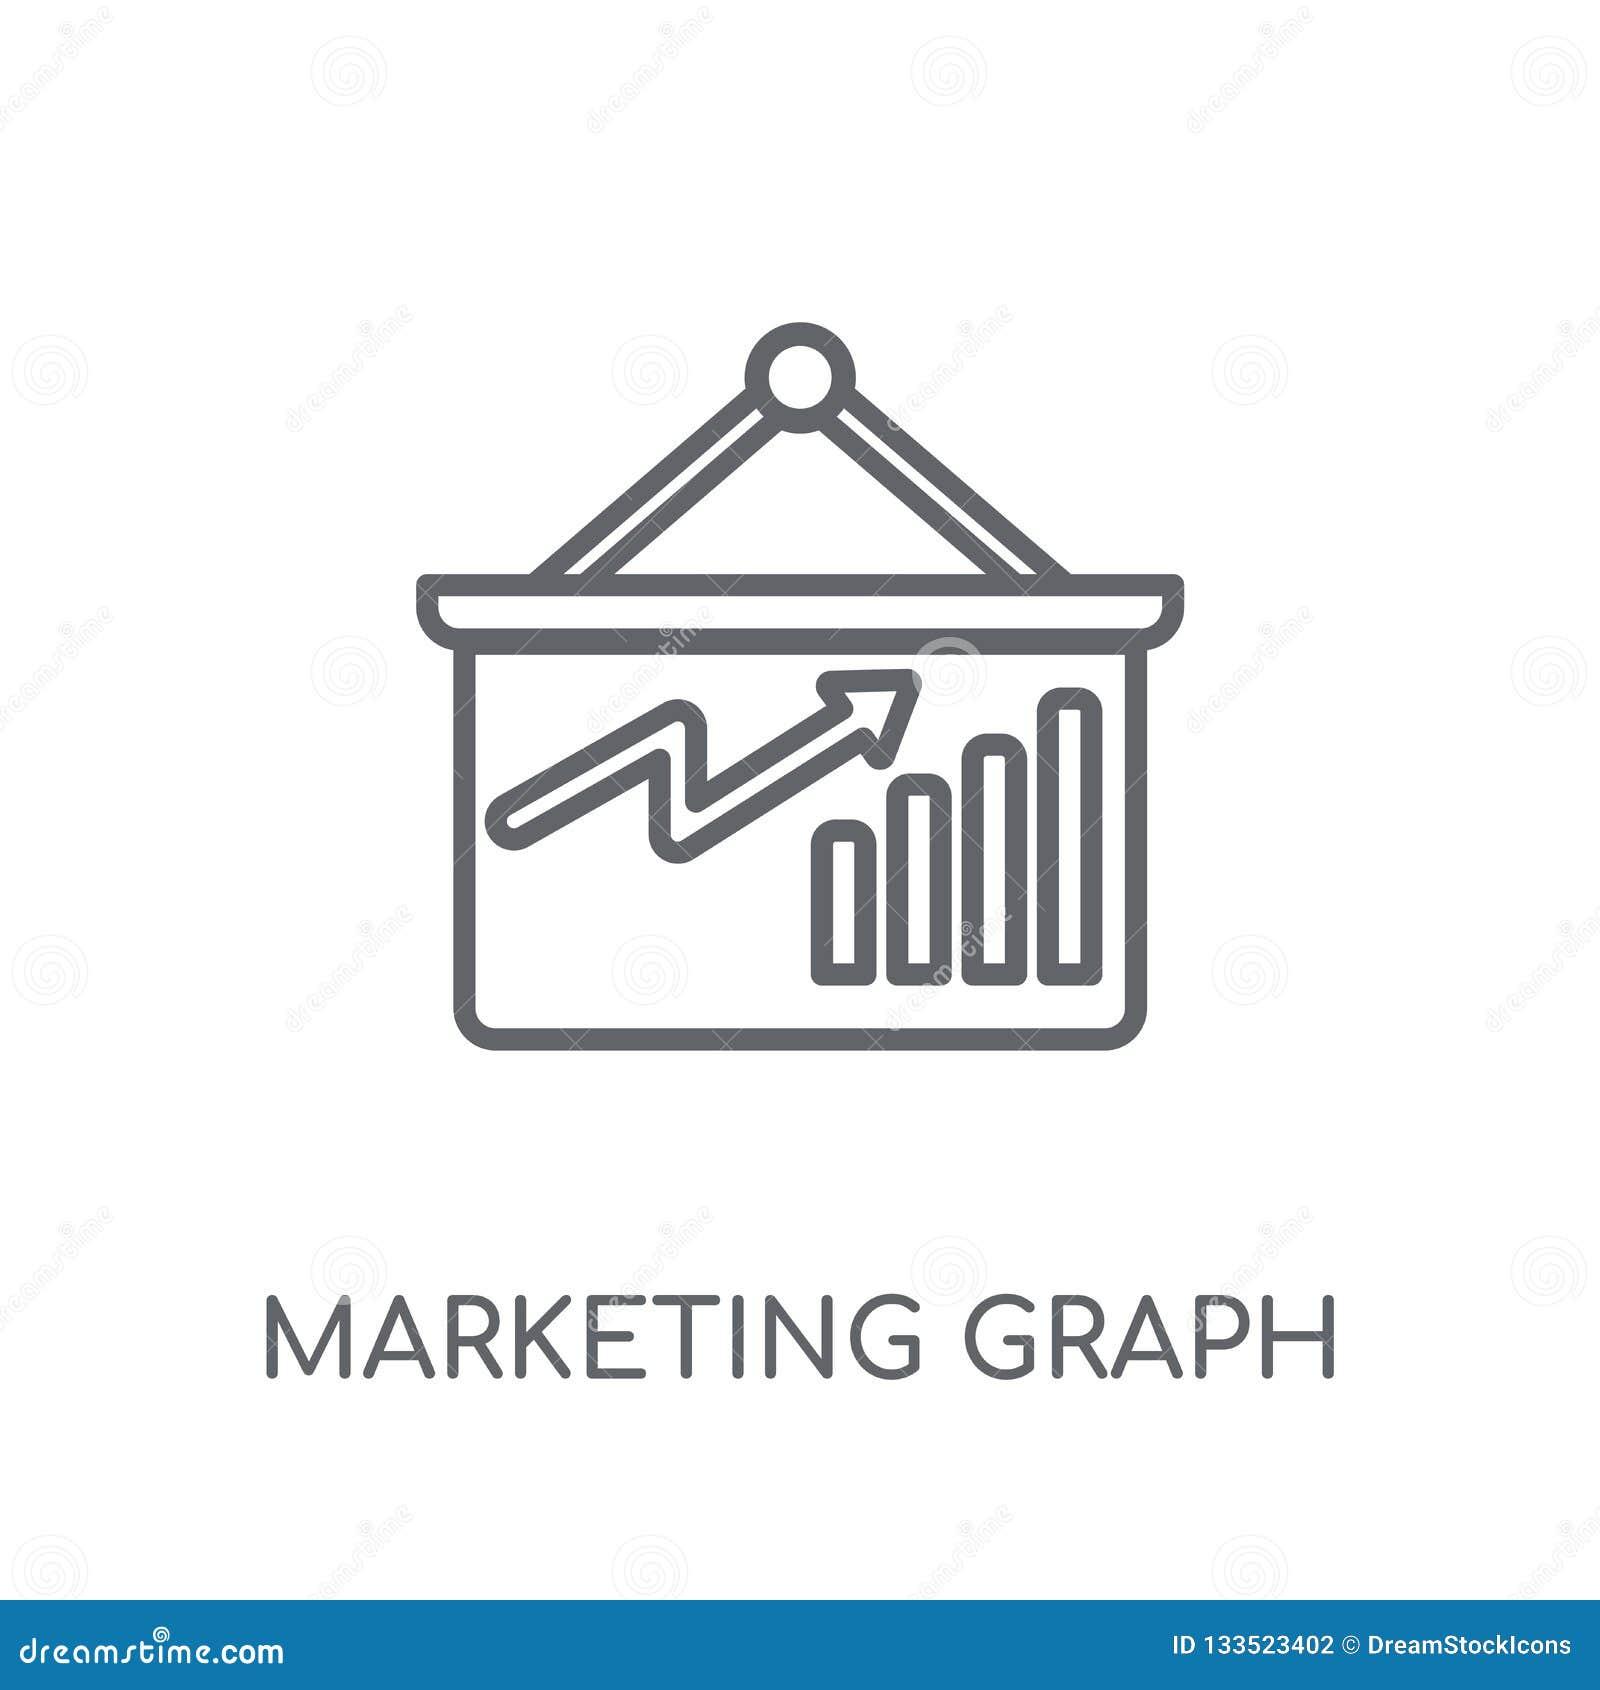 marketing Graph linear icon. Modern outline marketing Graph logo